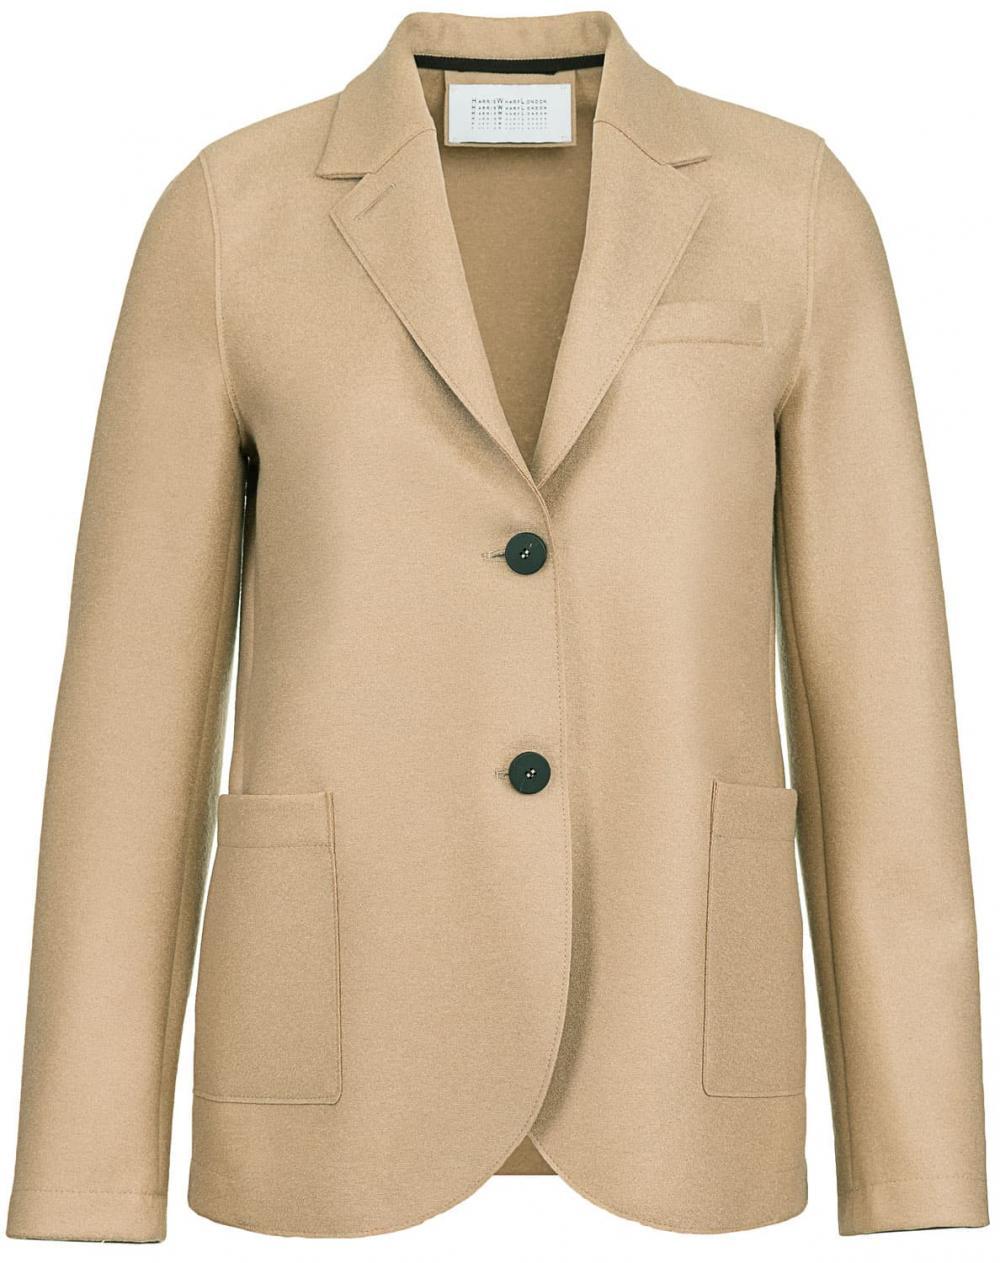 Blazer Light Pressed Wool